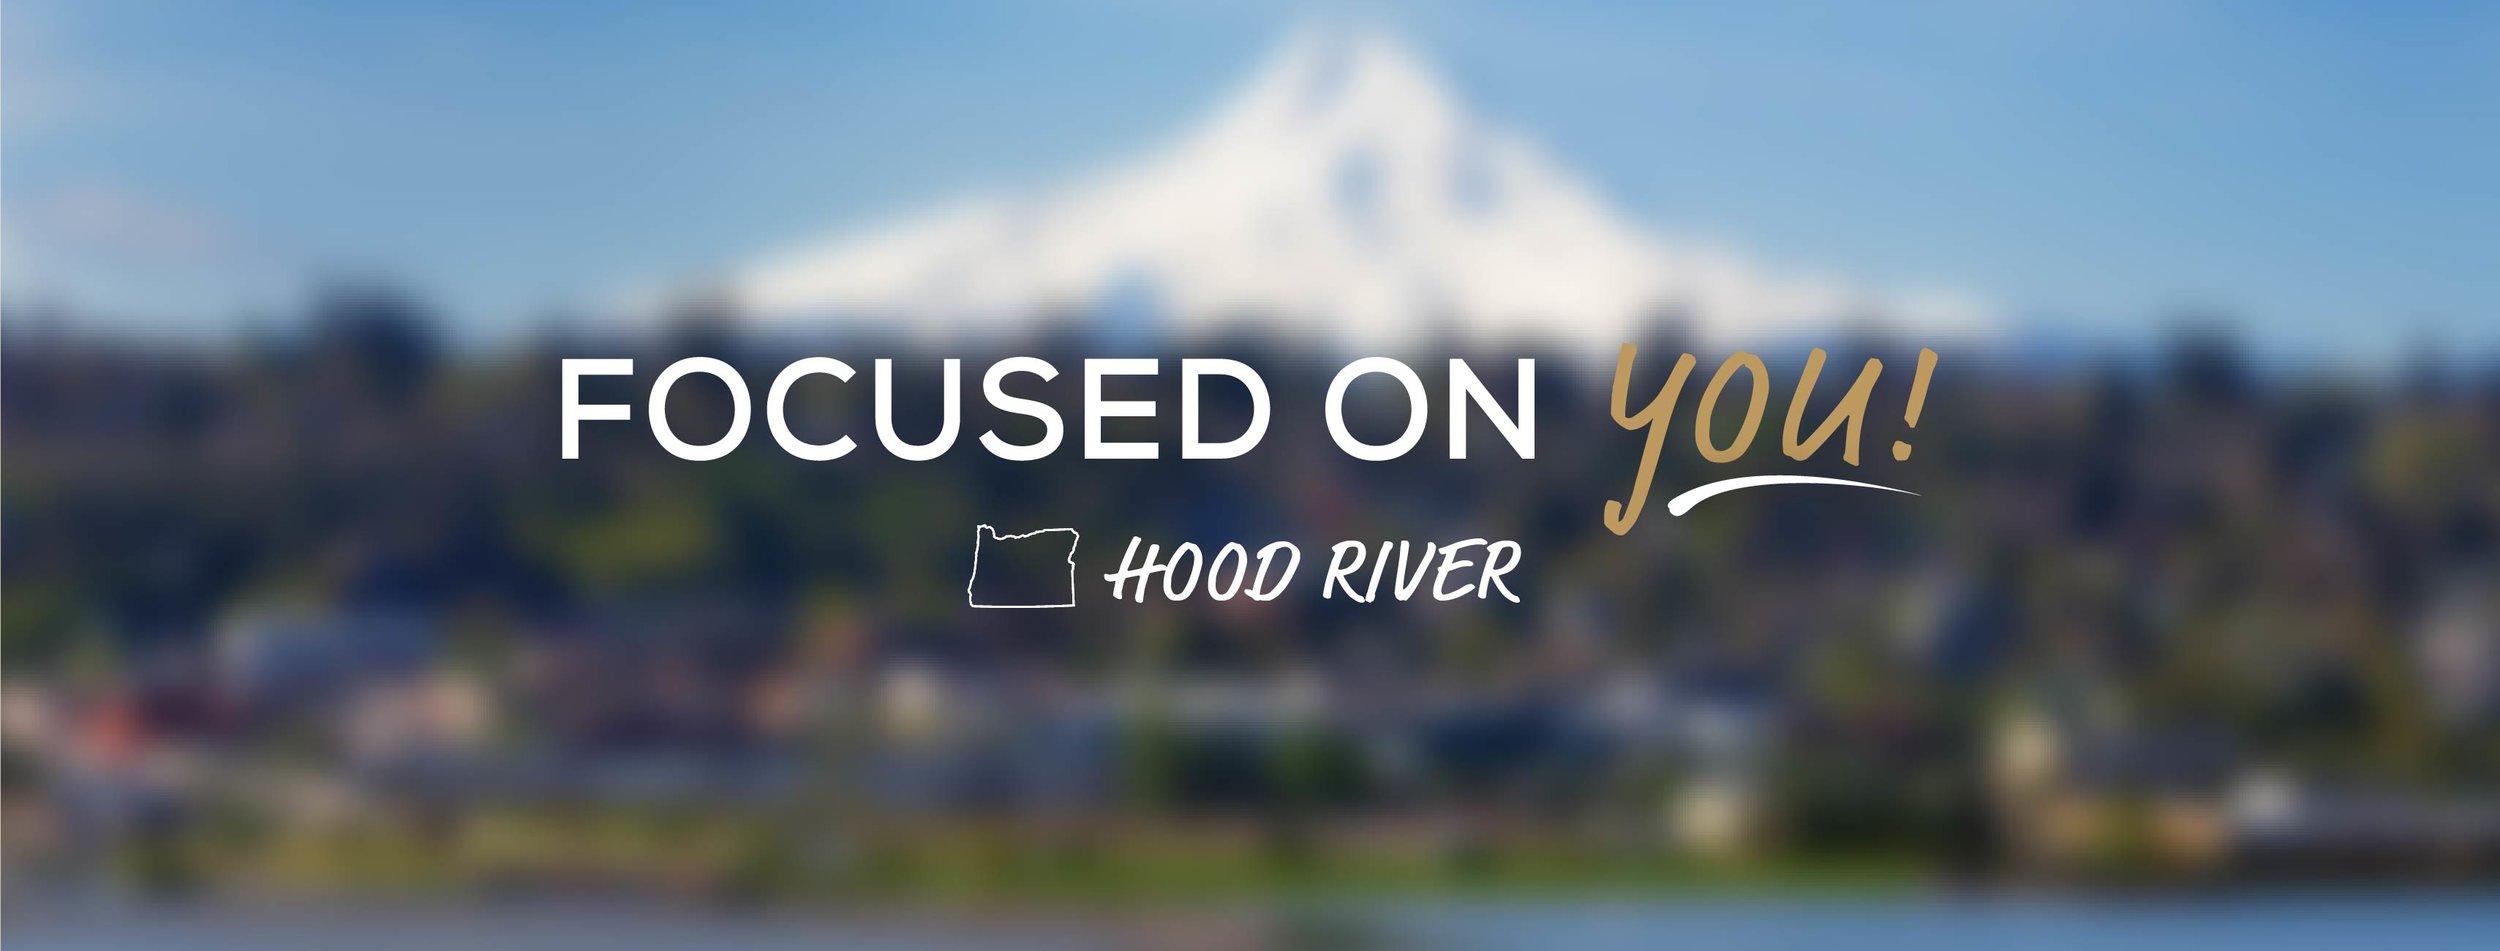 Hood River - 541.436.2662hoodriver@directorsmortgage.net102 3rd StreetHood River, OR 97031